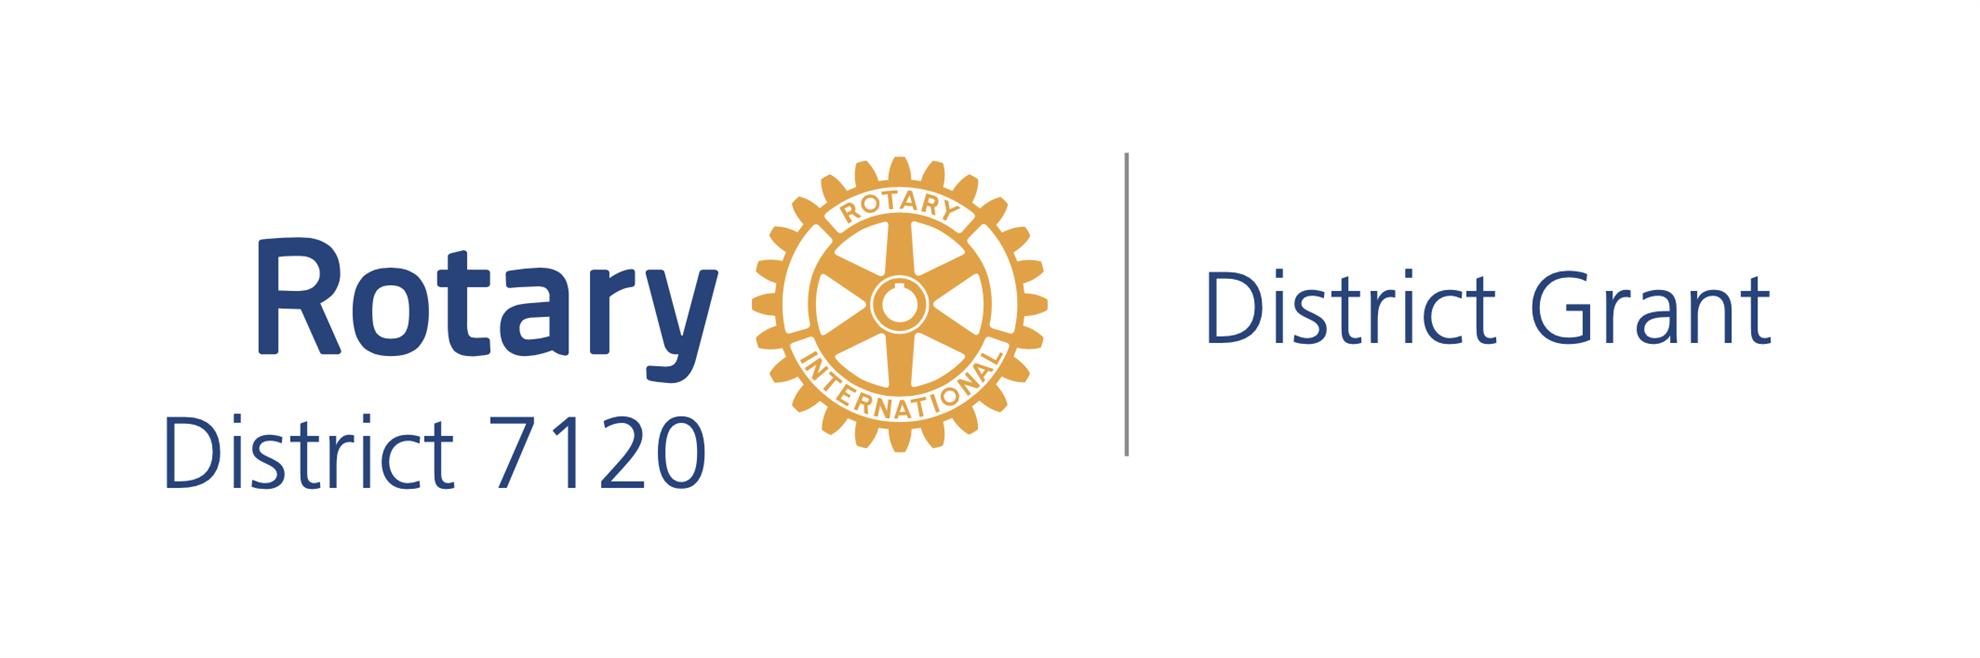 District Grant 2020/21 Final Report Deadline